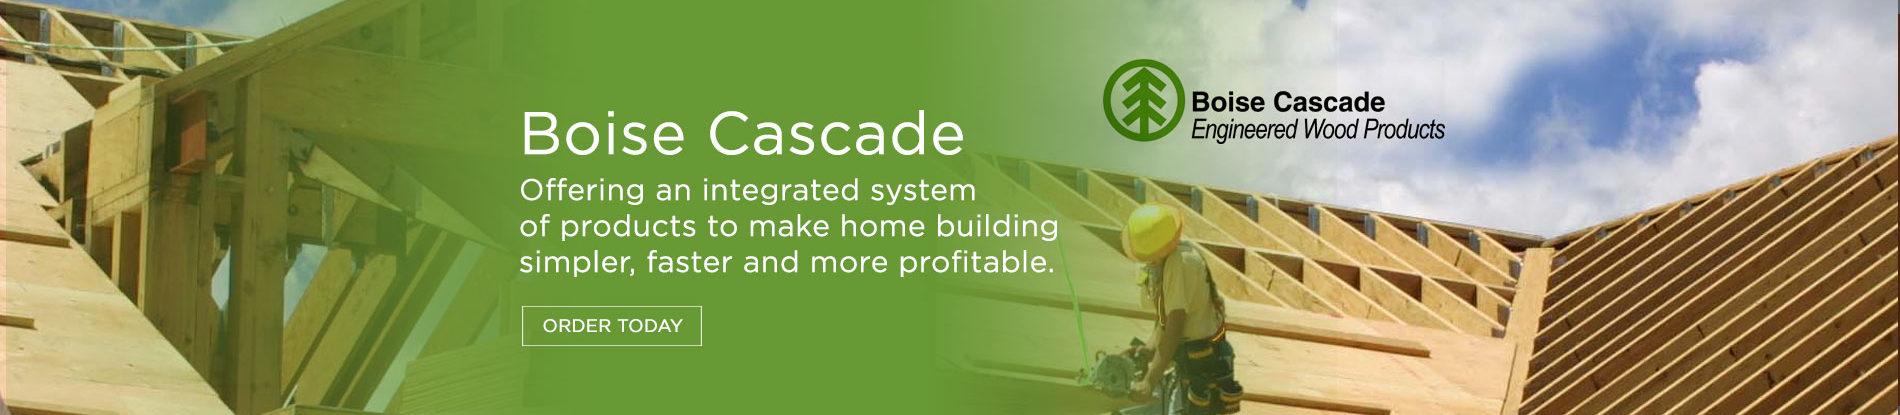 Warren Trask, Warren Trask Company, Premium Building Materials, Building Materials, Boise Cascade